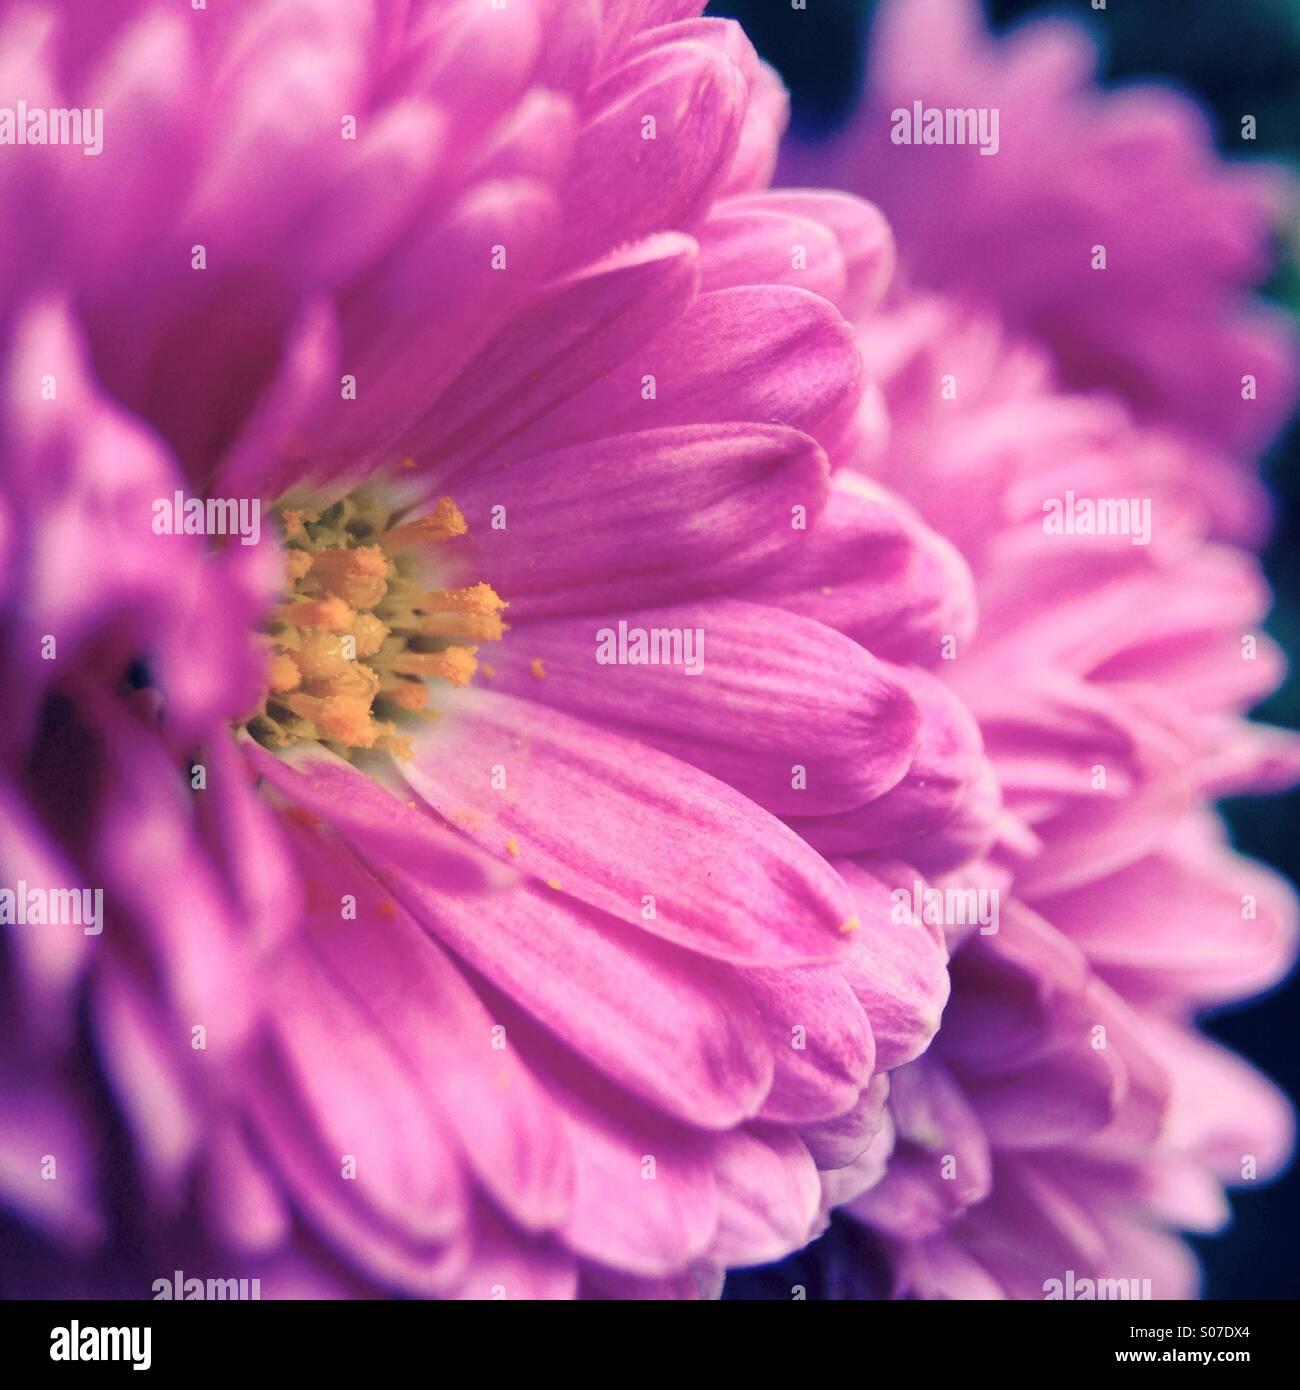 Chrysanthemums close up - Stock Image